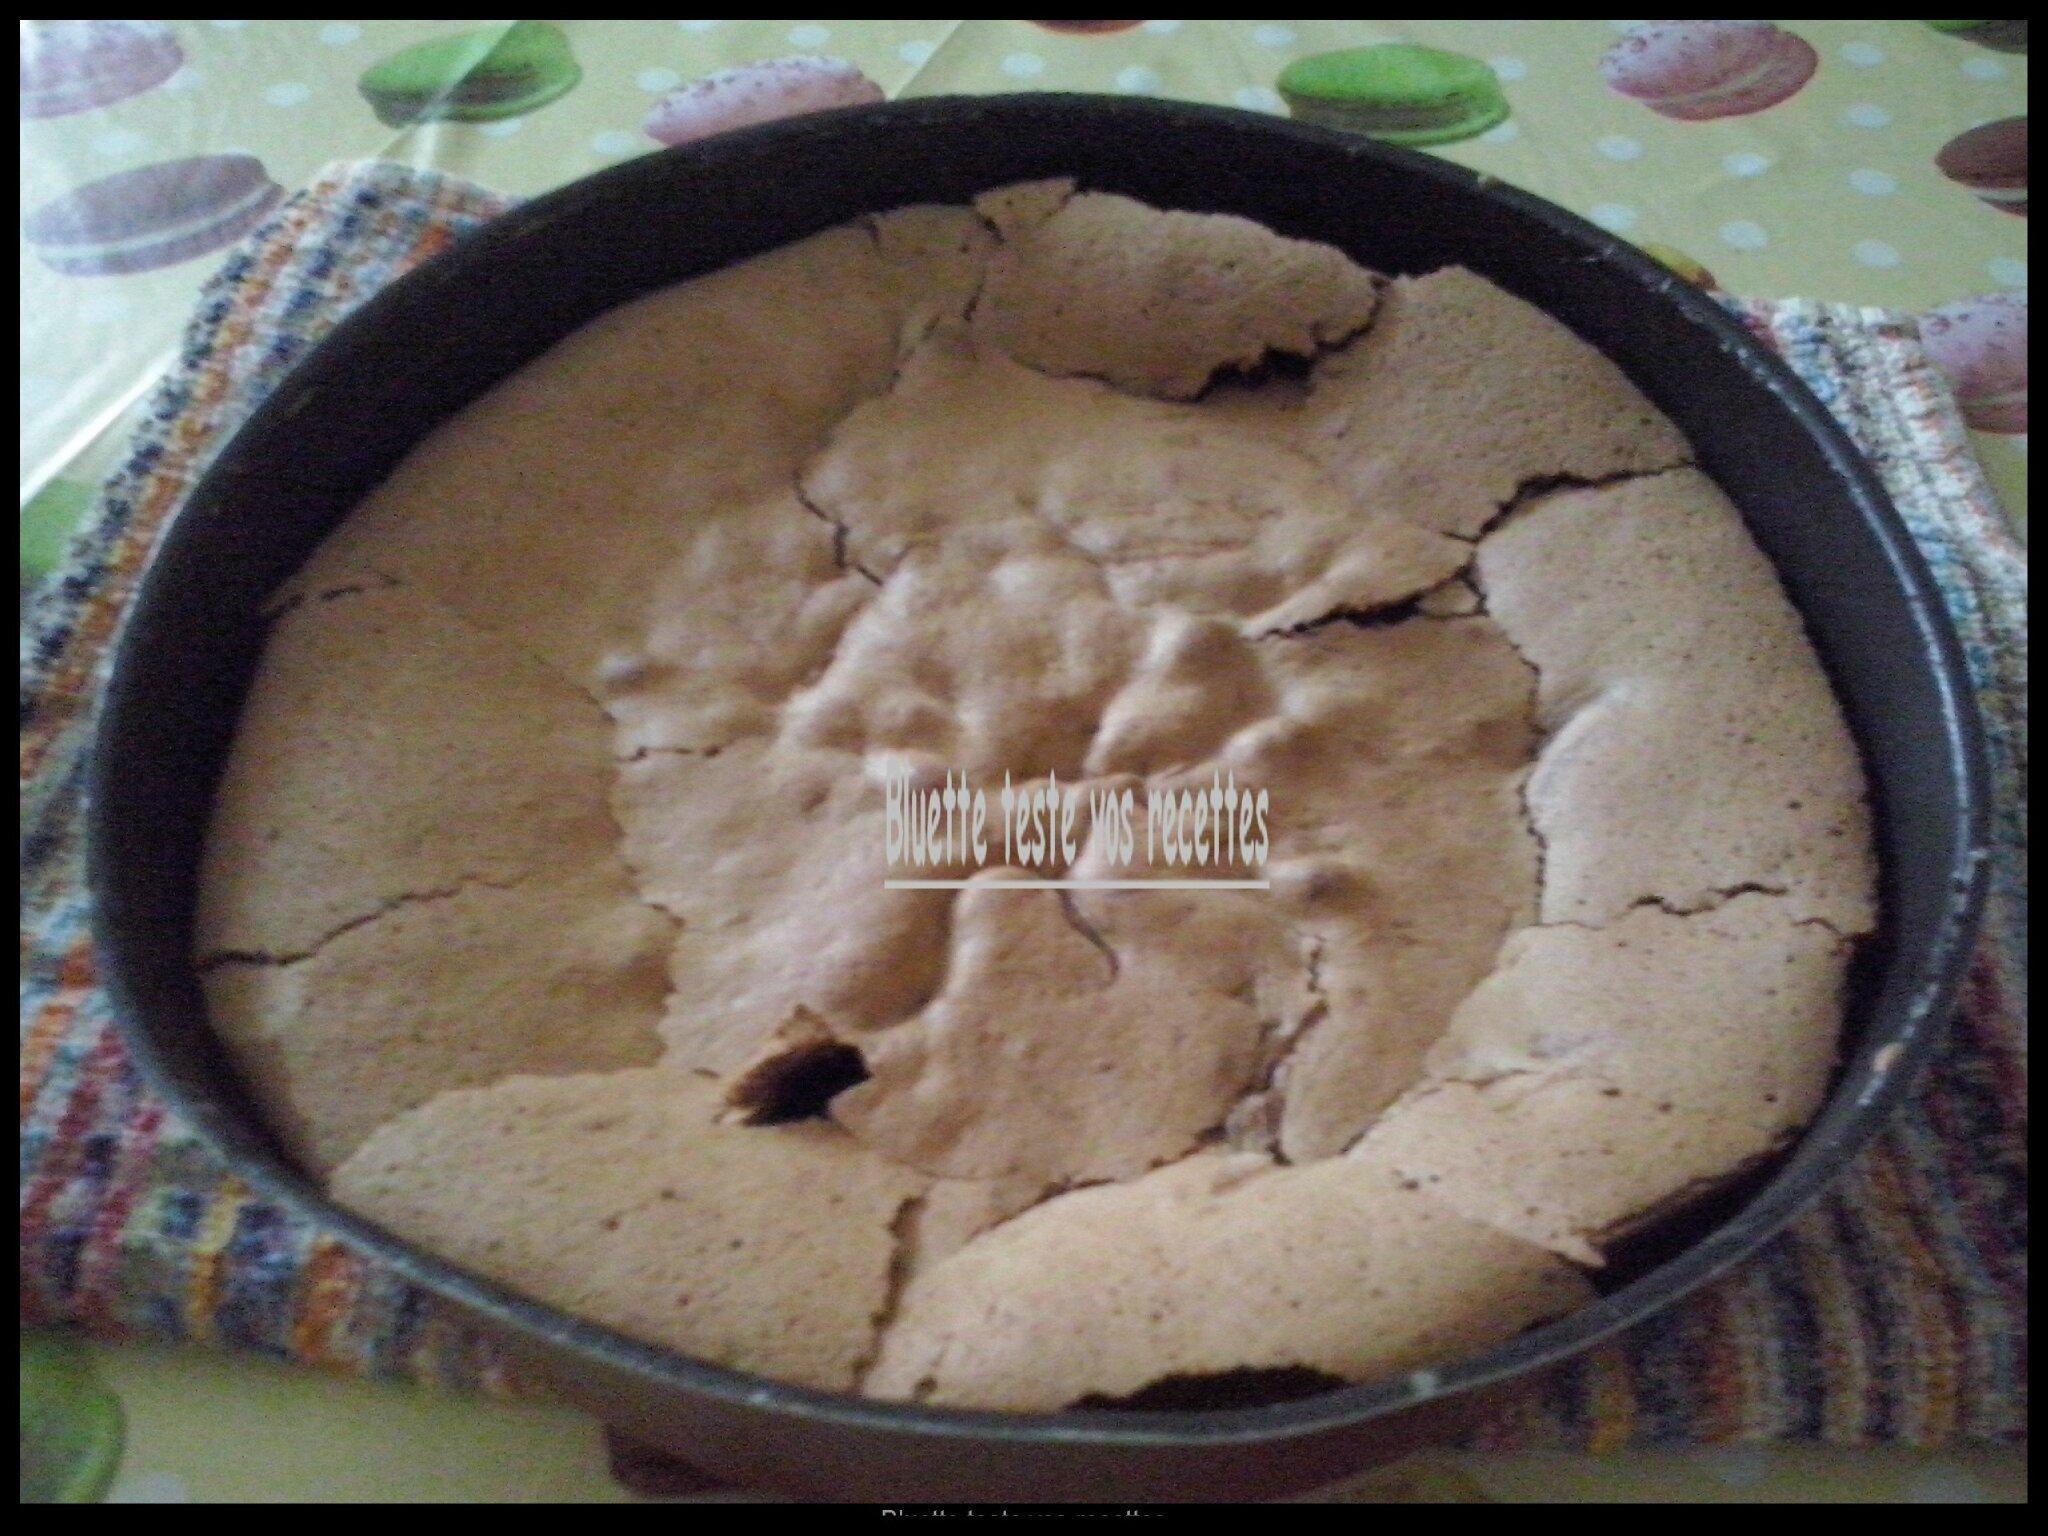 Bluette teste le gâteau Bellevue de Christophe Felder